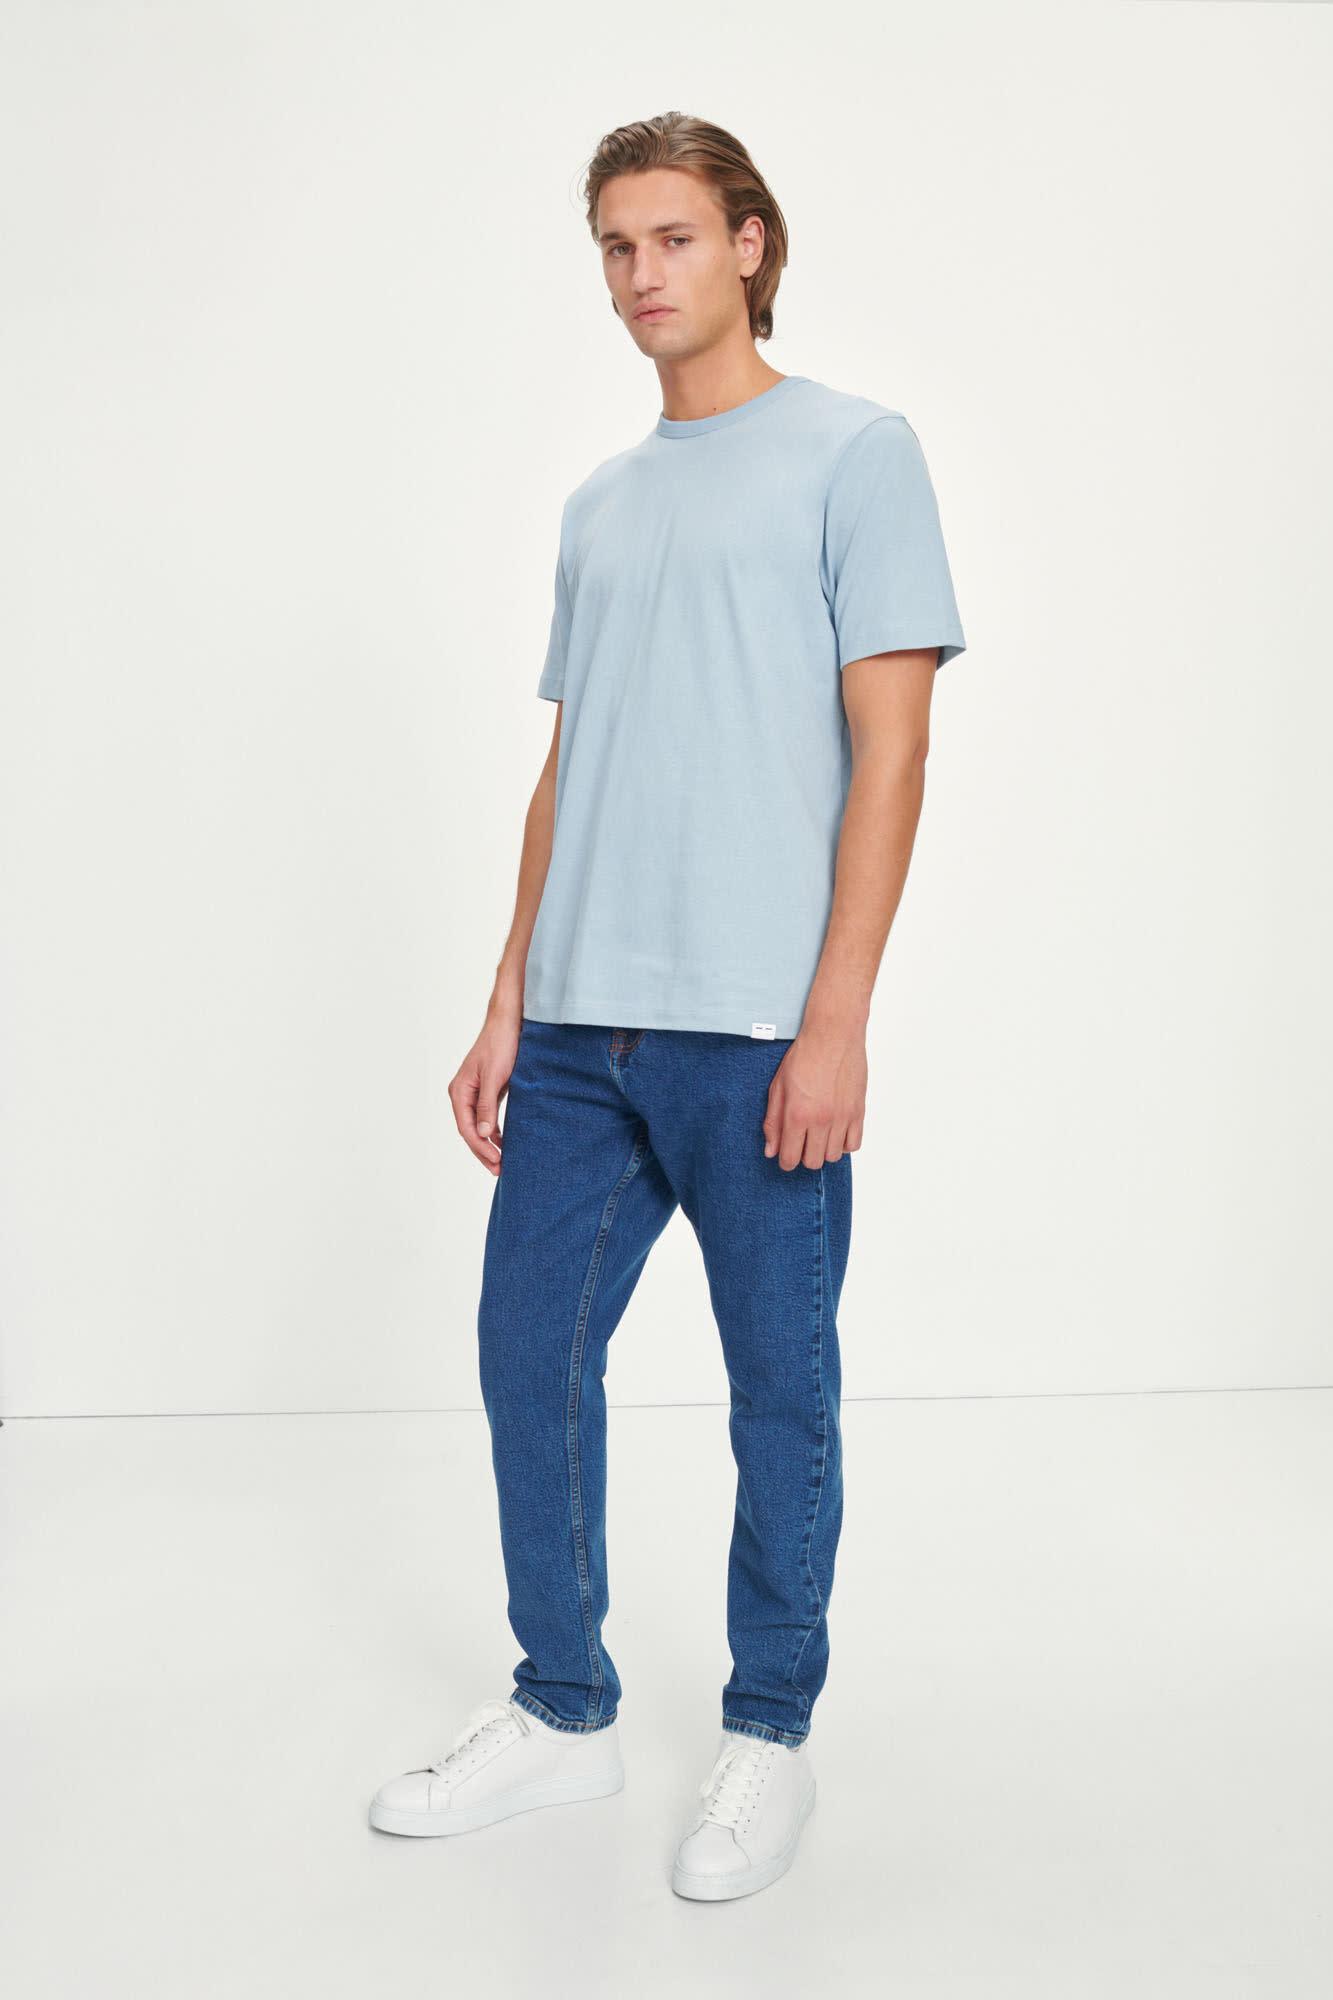 Hugo Cotton T-Shirt Dusty Blue-1